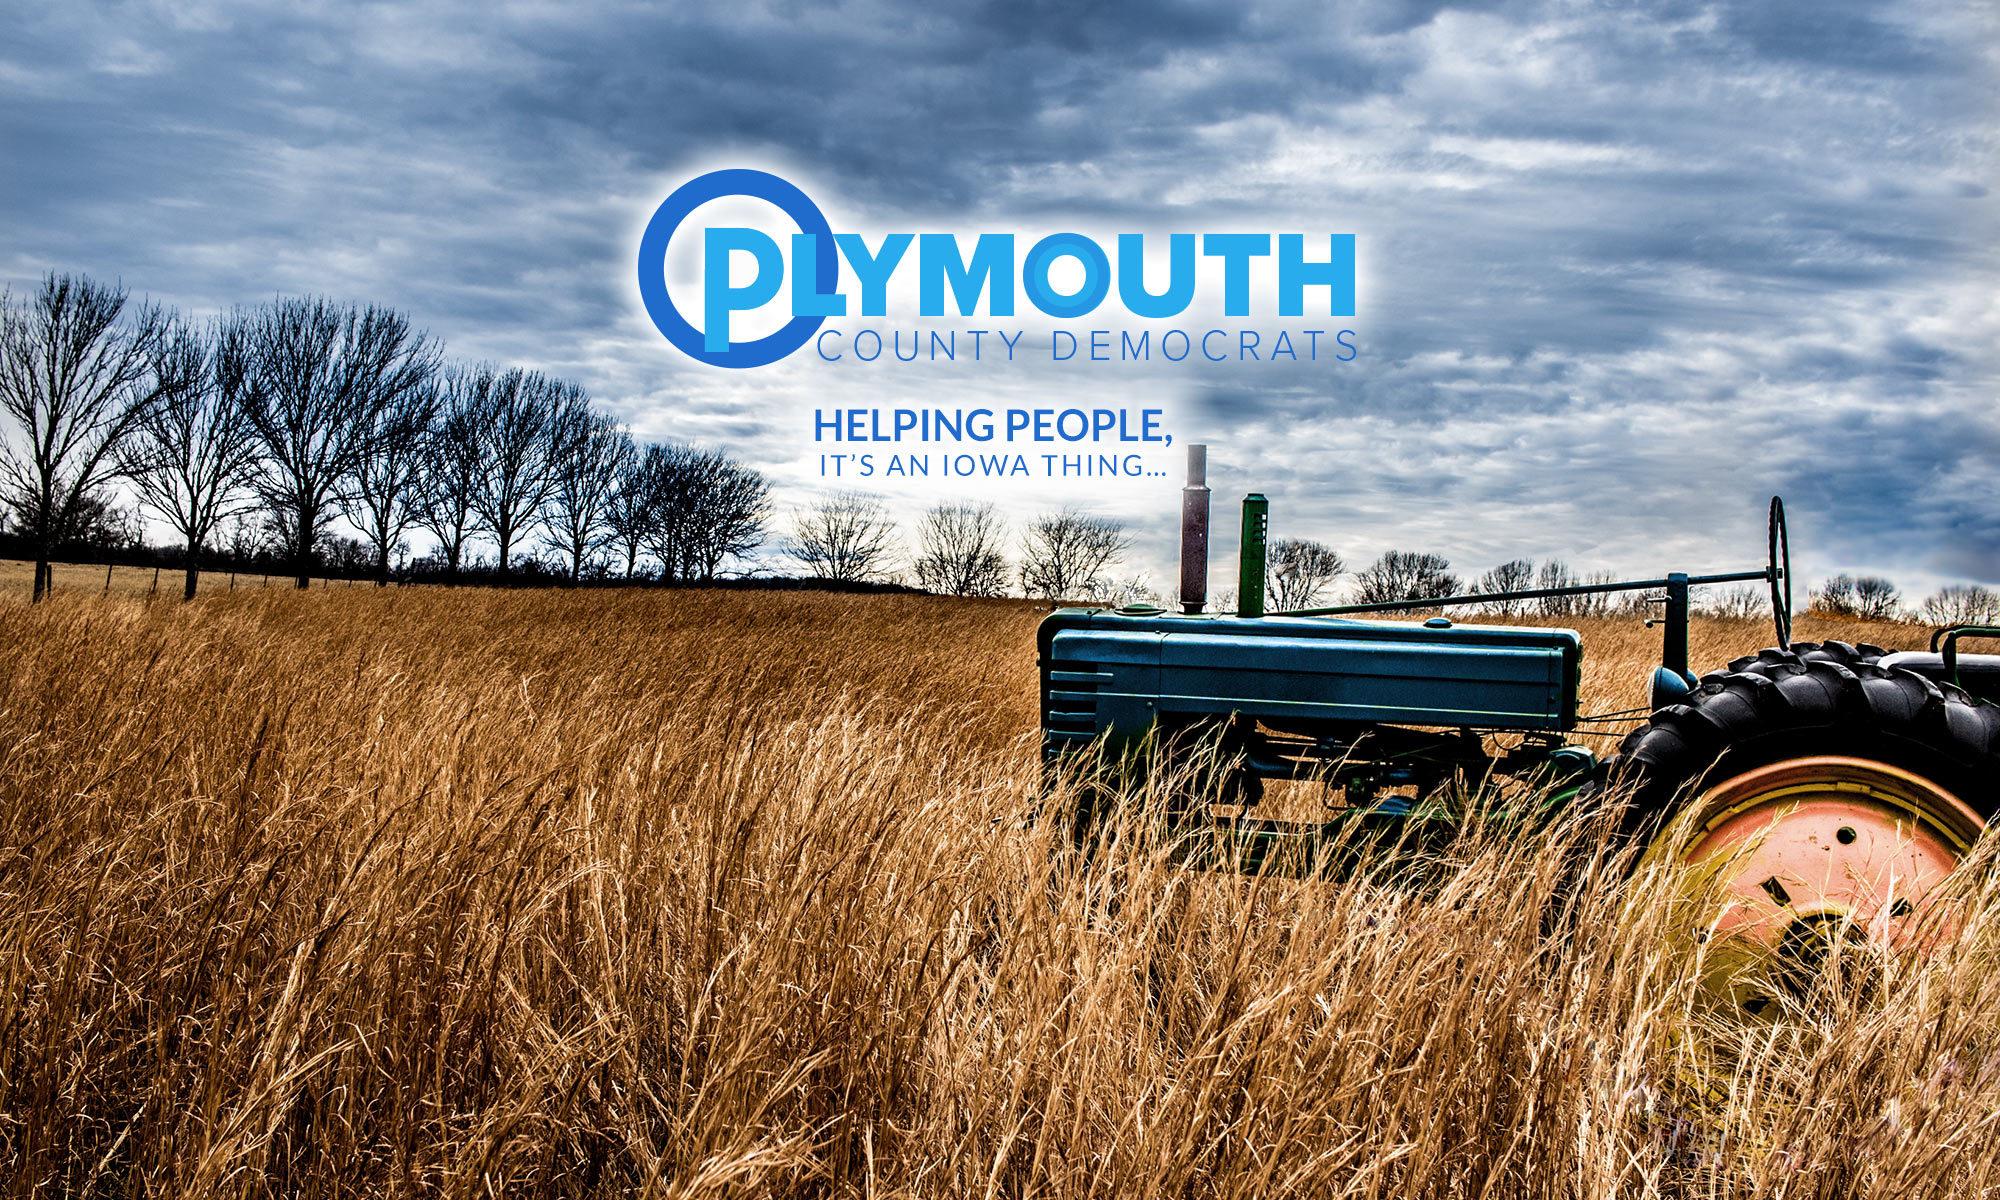 Plymouth County Democrats